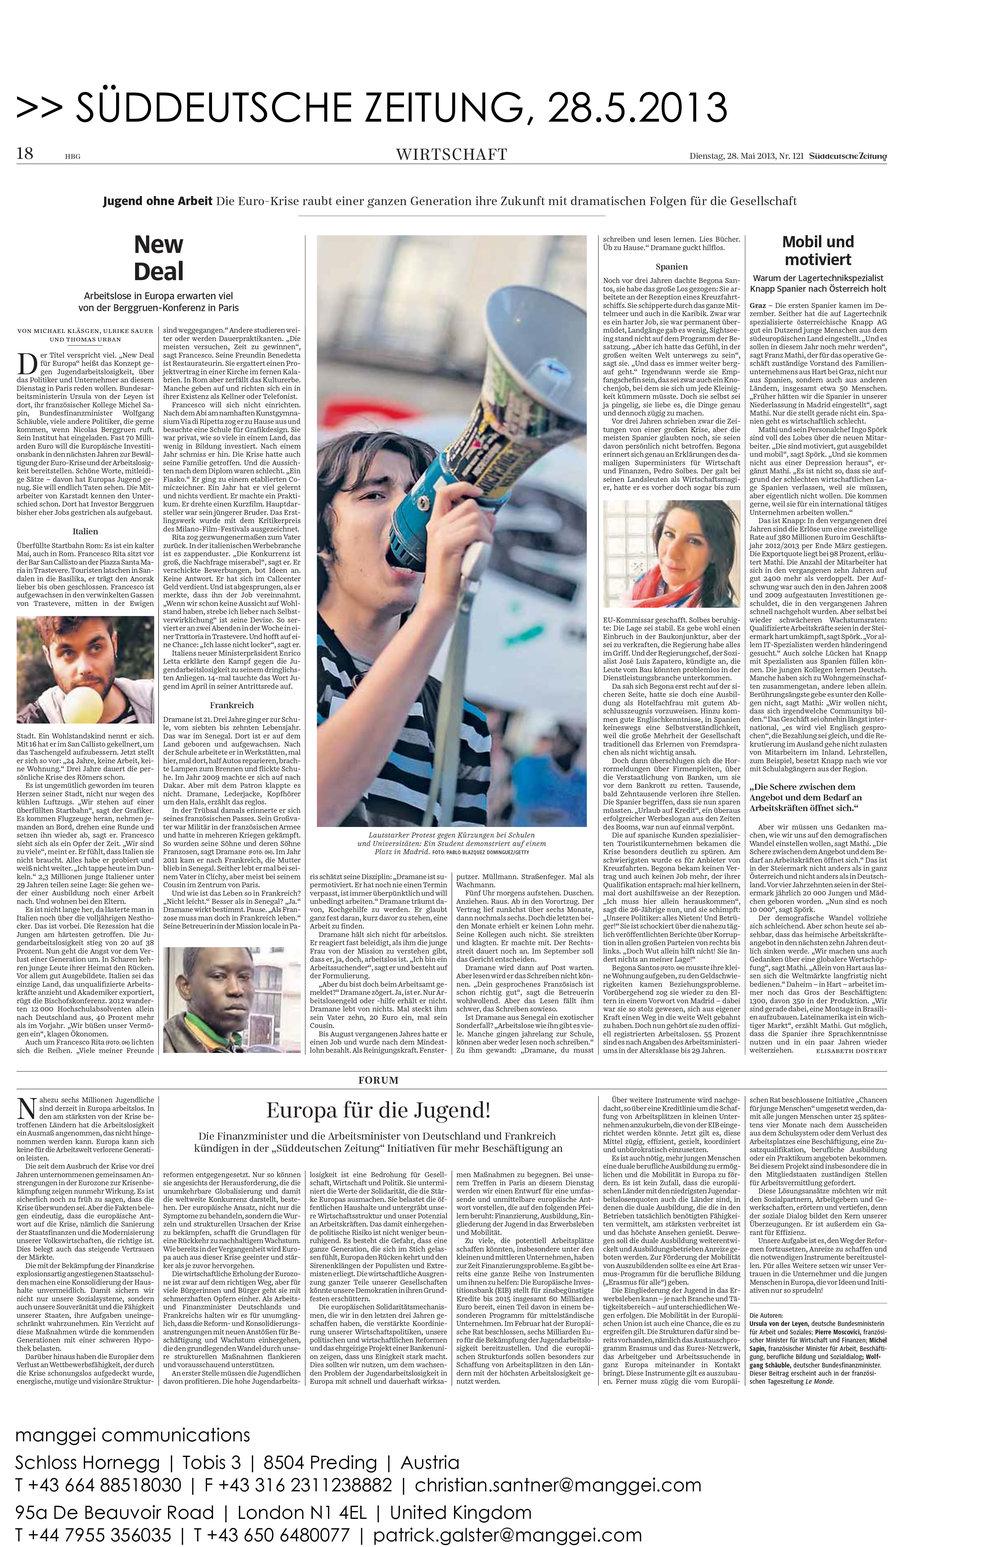 manggei-communications---presse-clippings-komplett---journalistenreise-2013_-2.jpg